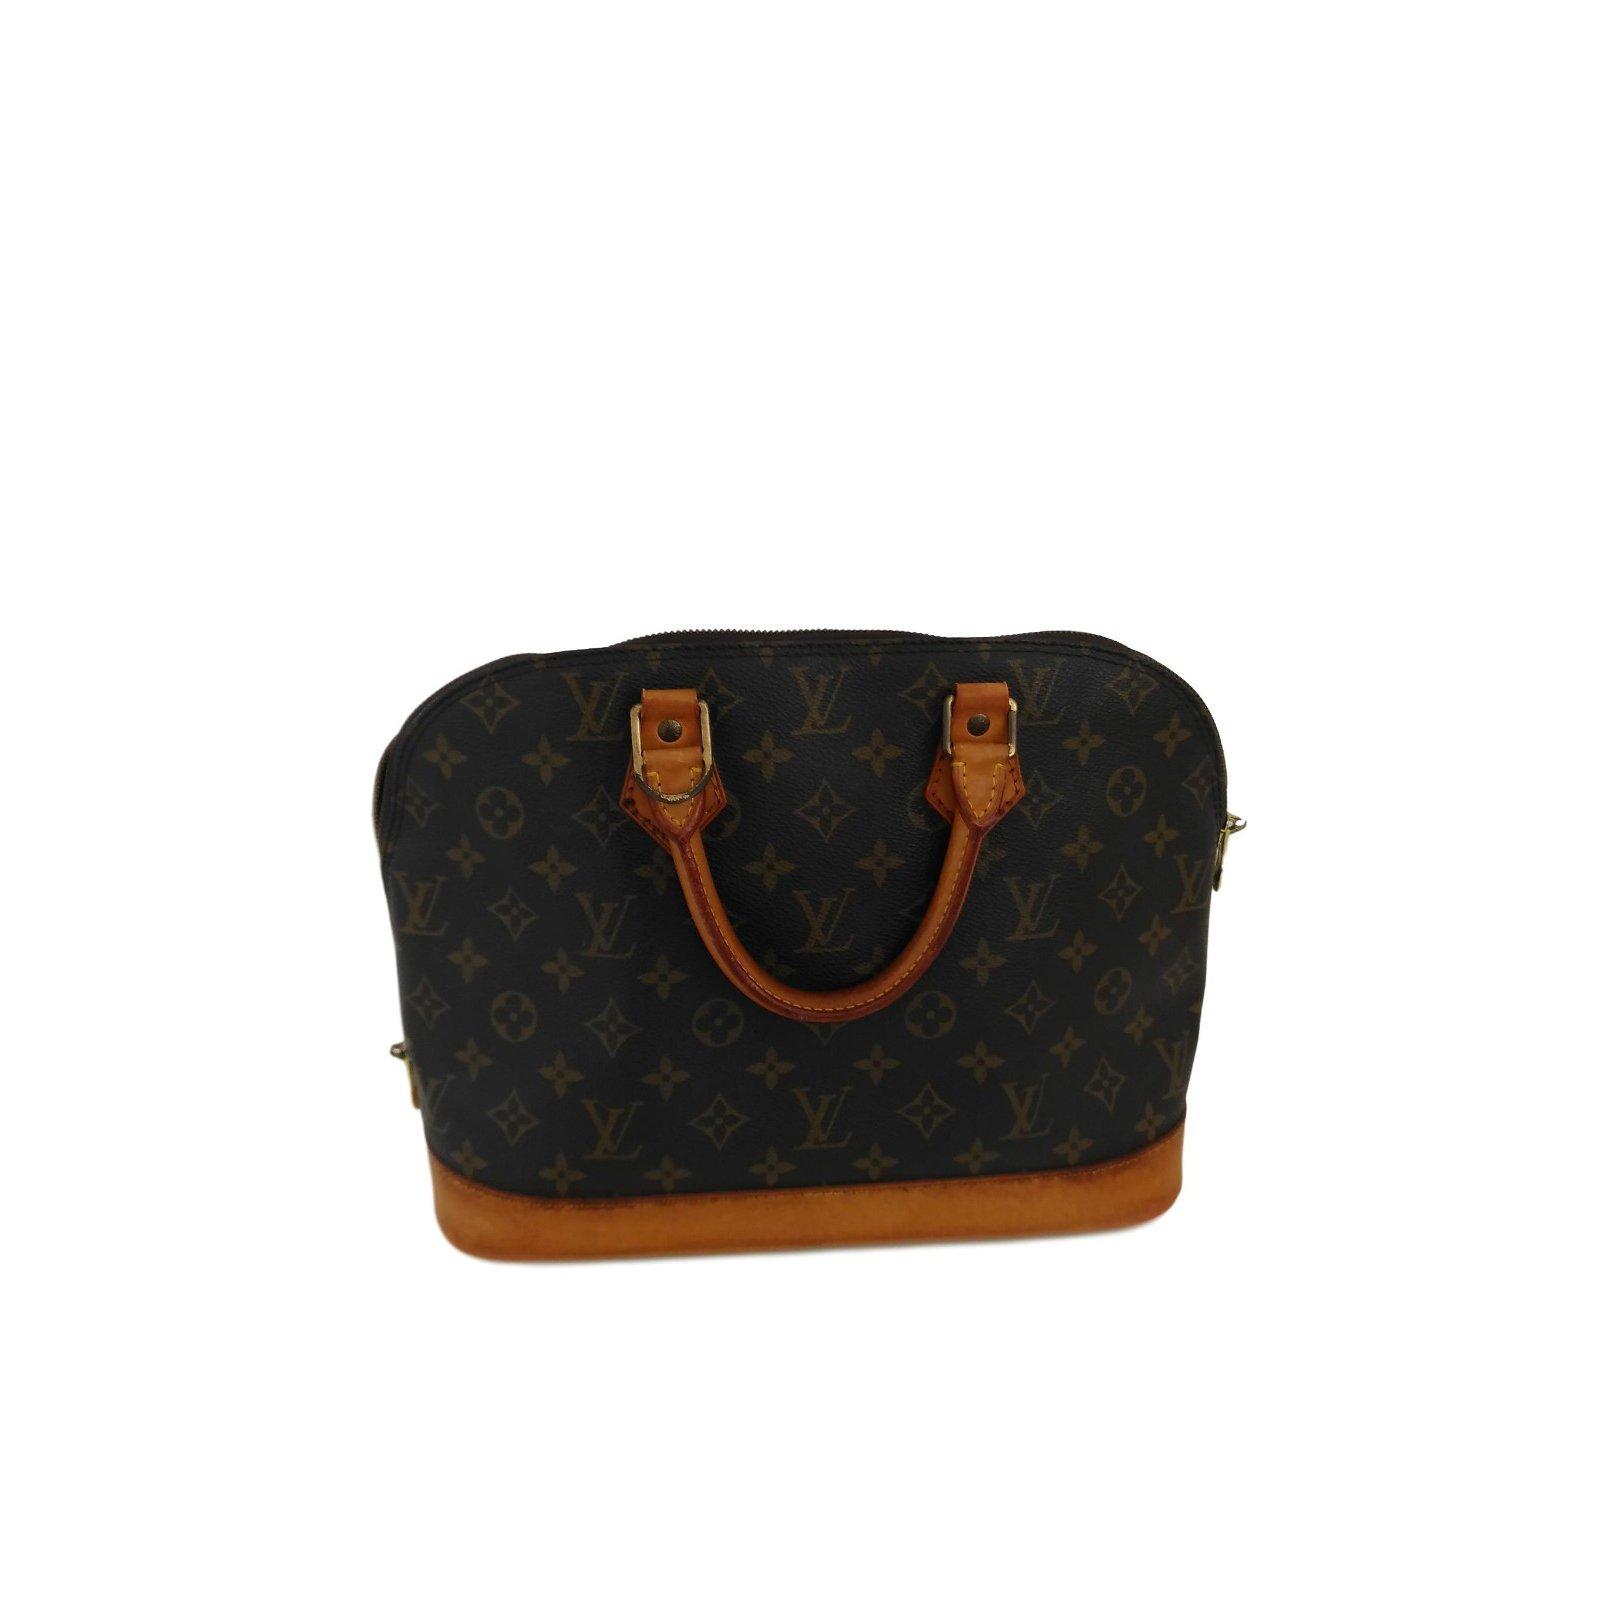 Louis Vuitton Alma Handbags Leather Brown Ref 71993